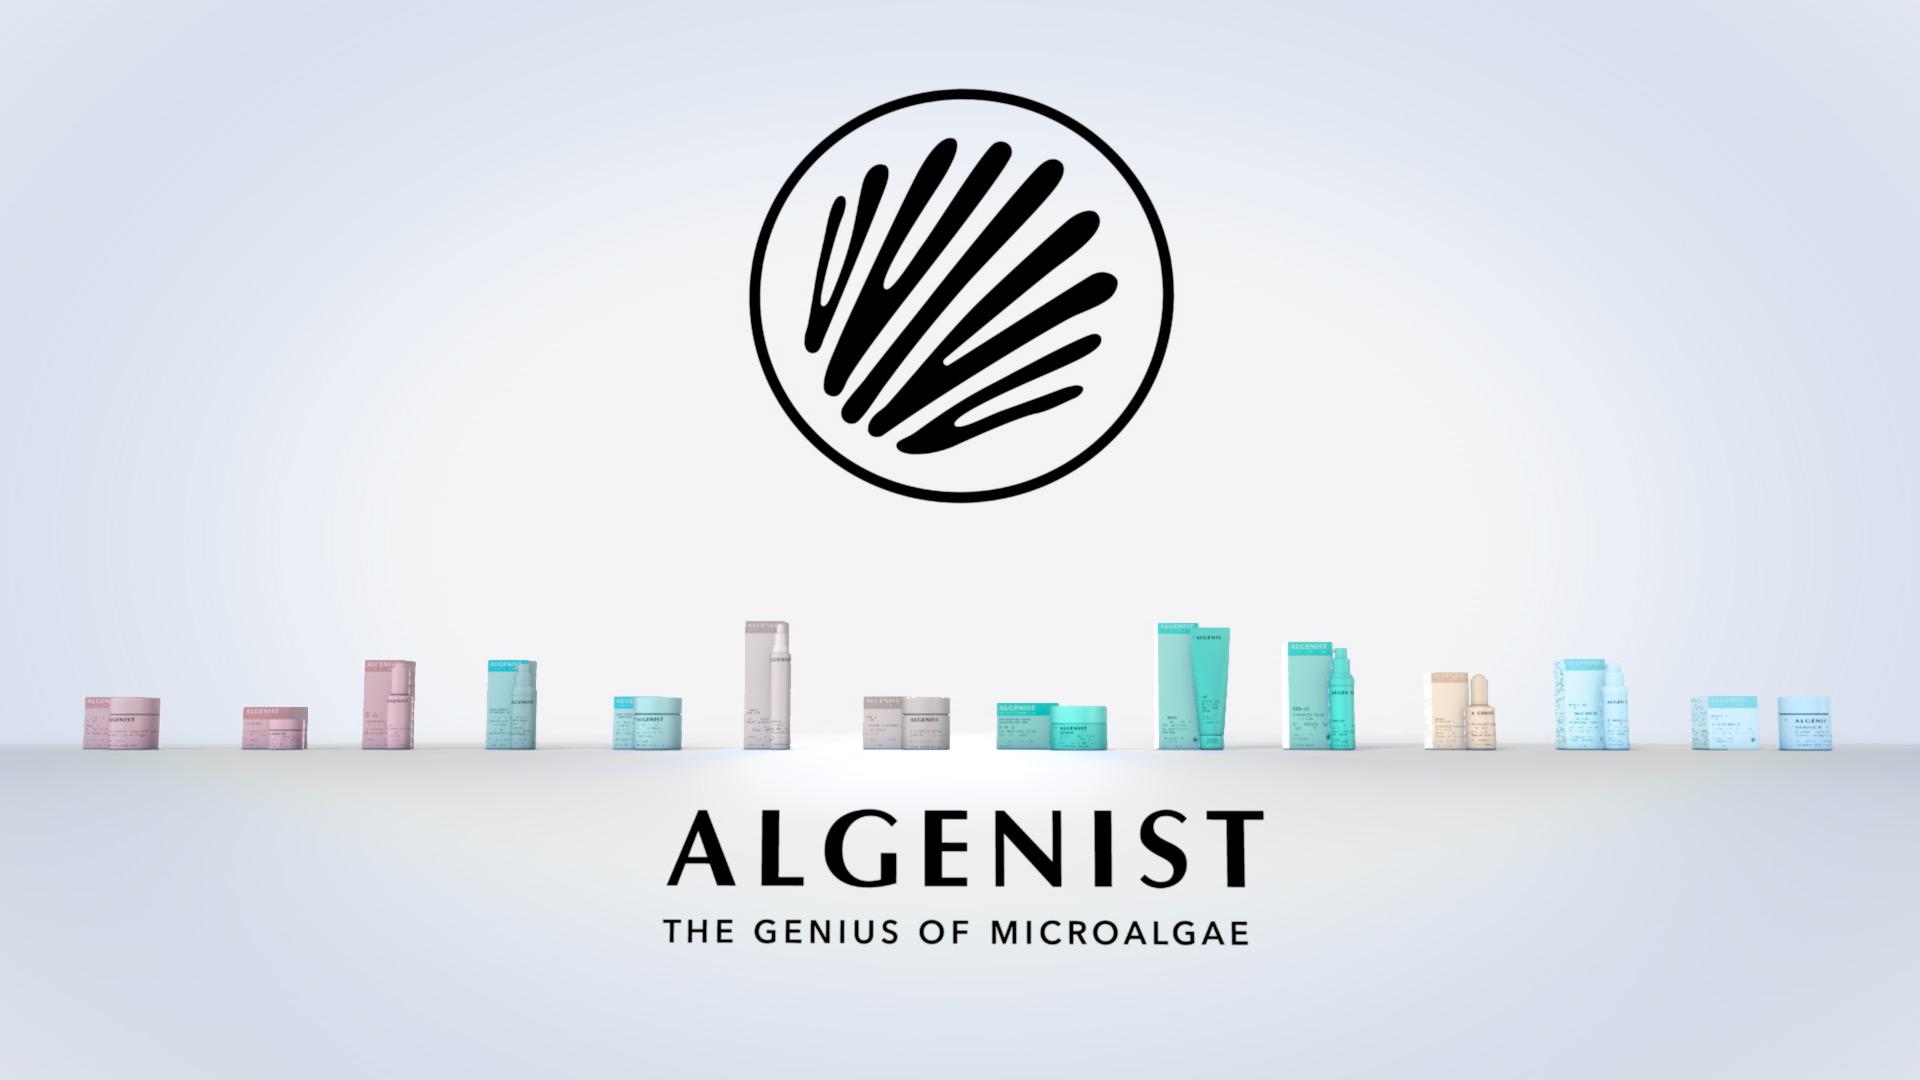 Algenist Rebranding Video